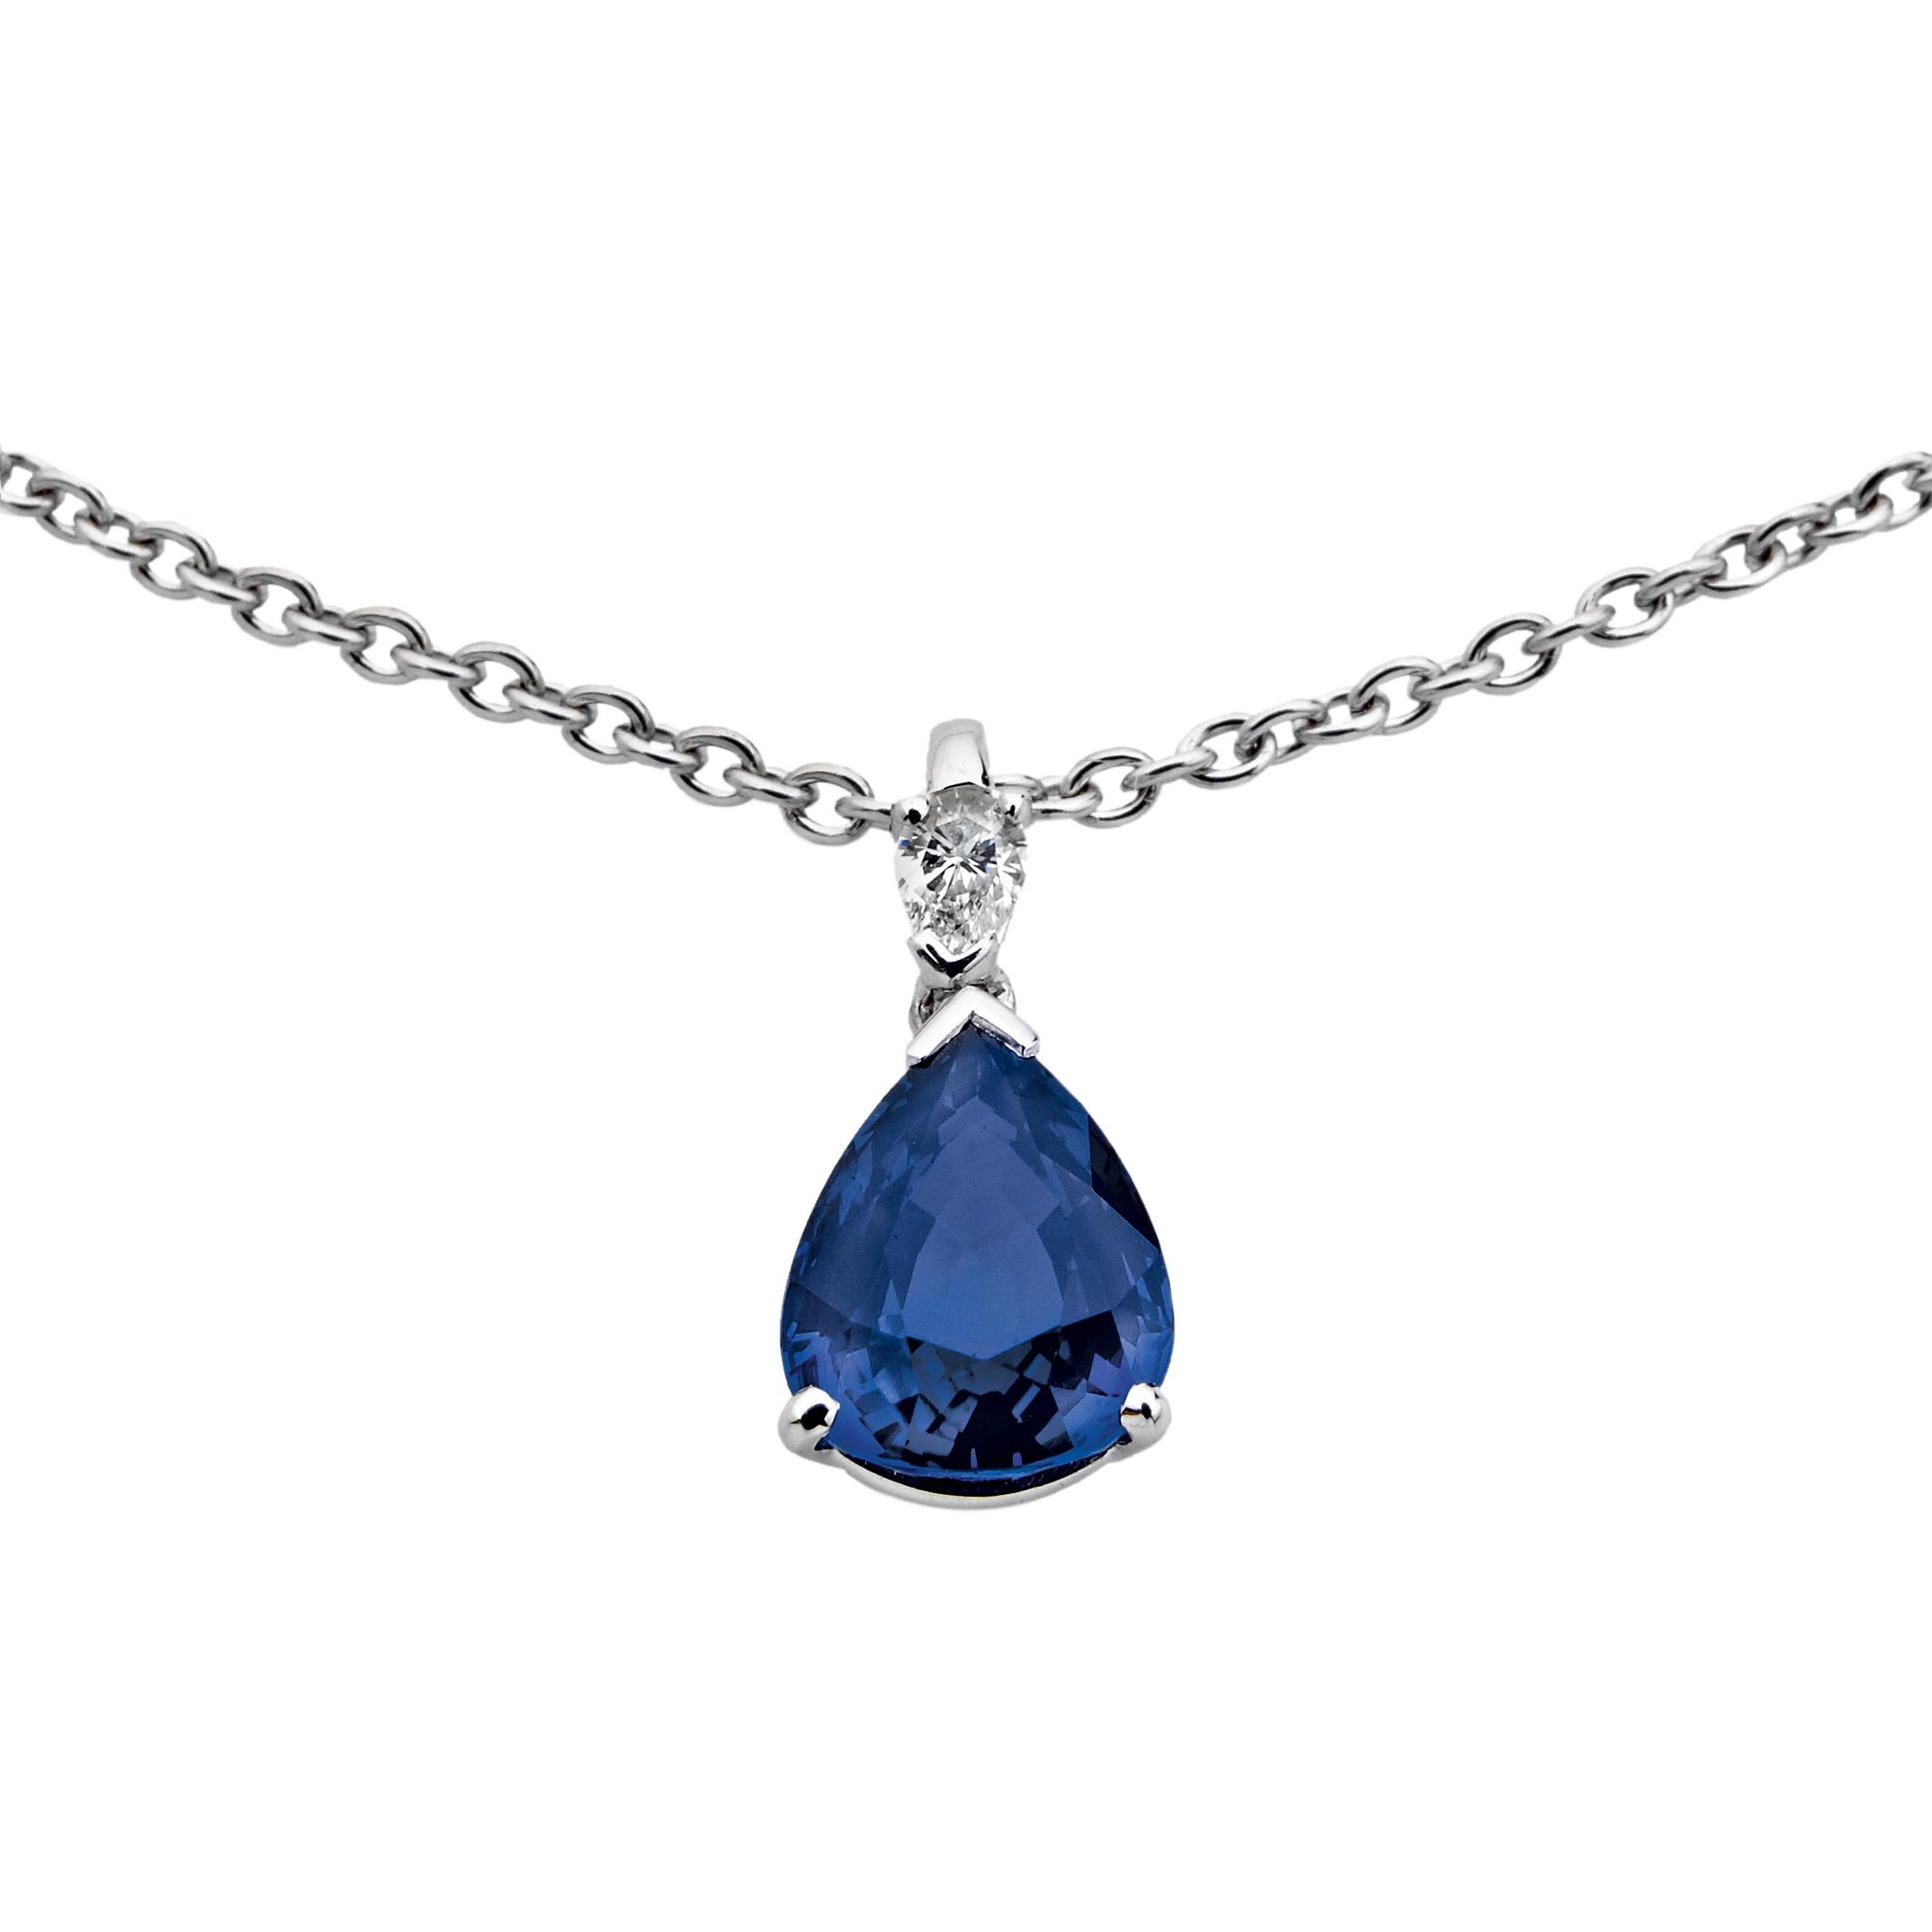 Pendentif Saphir et Diamants - Pascal IZERN